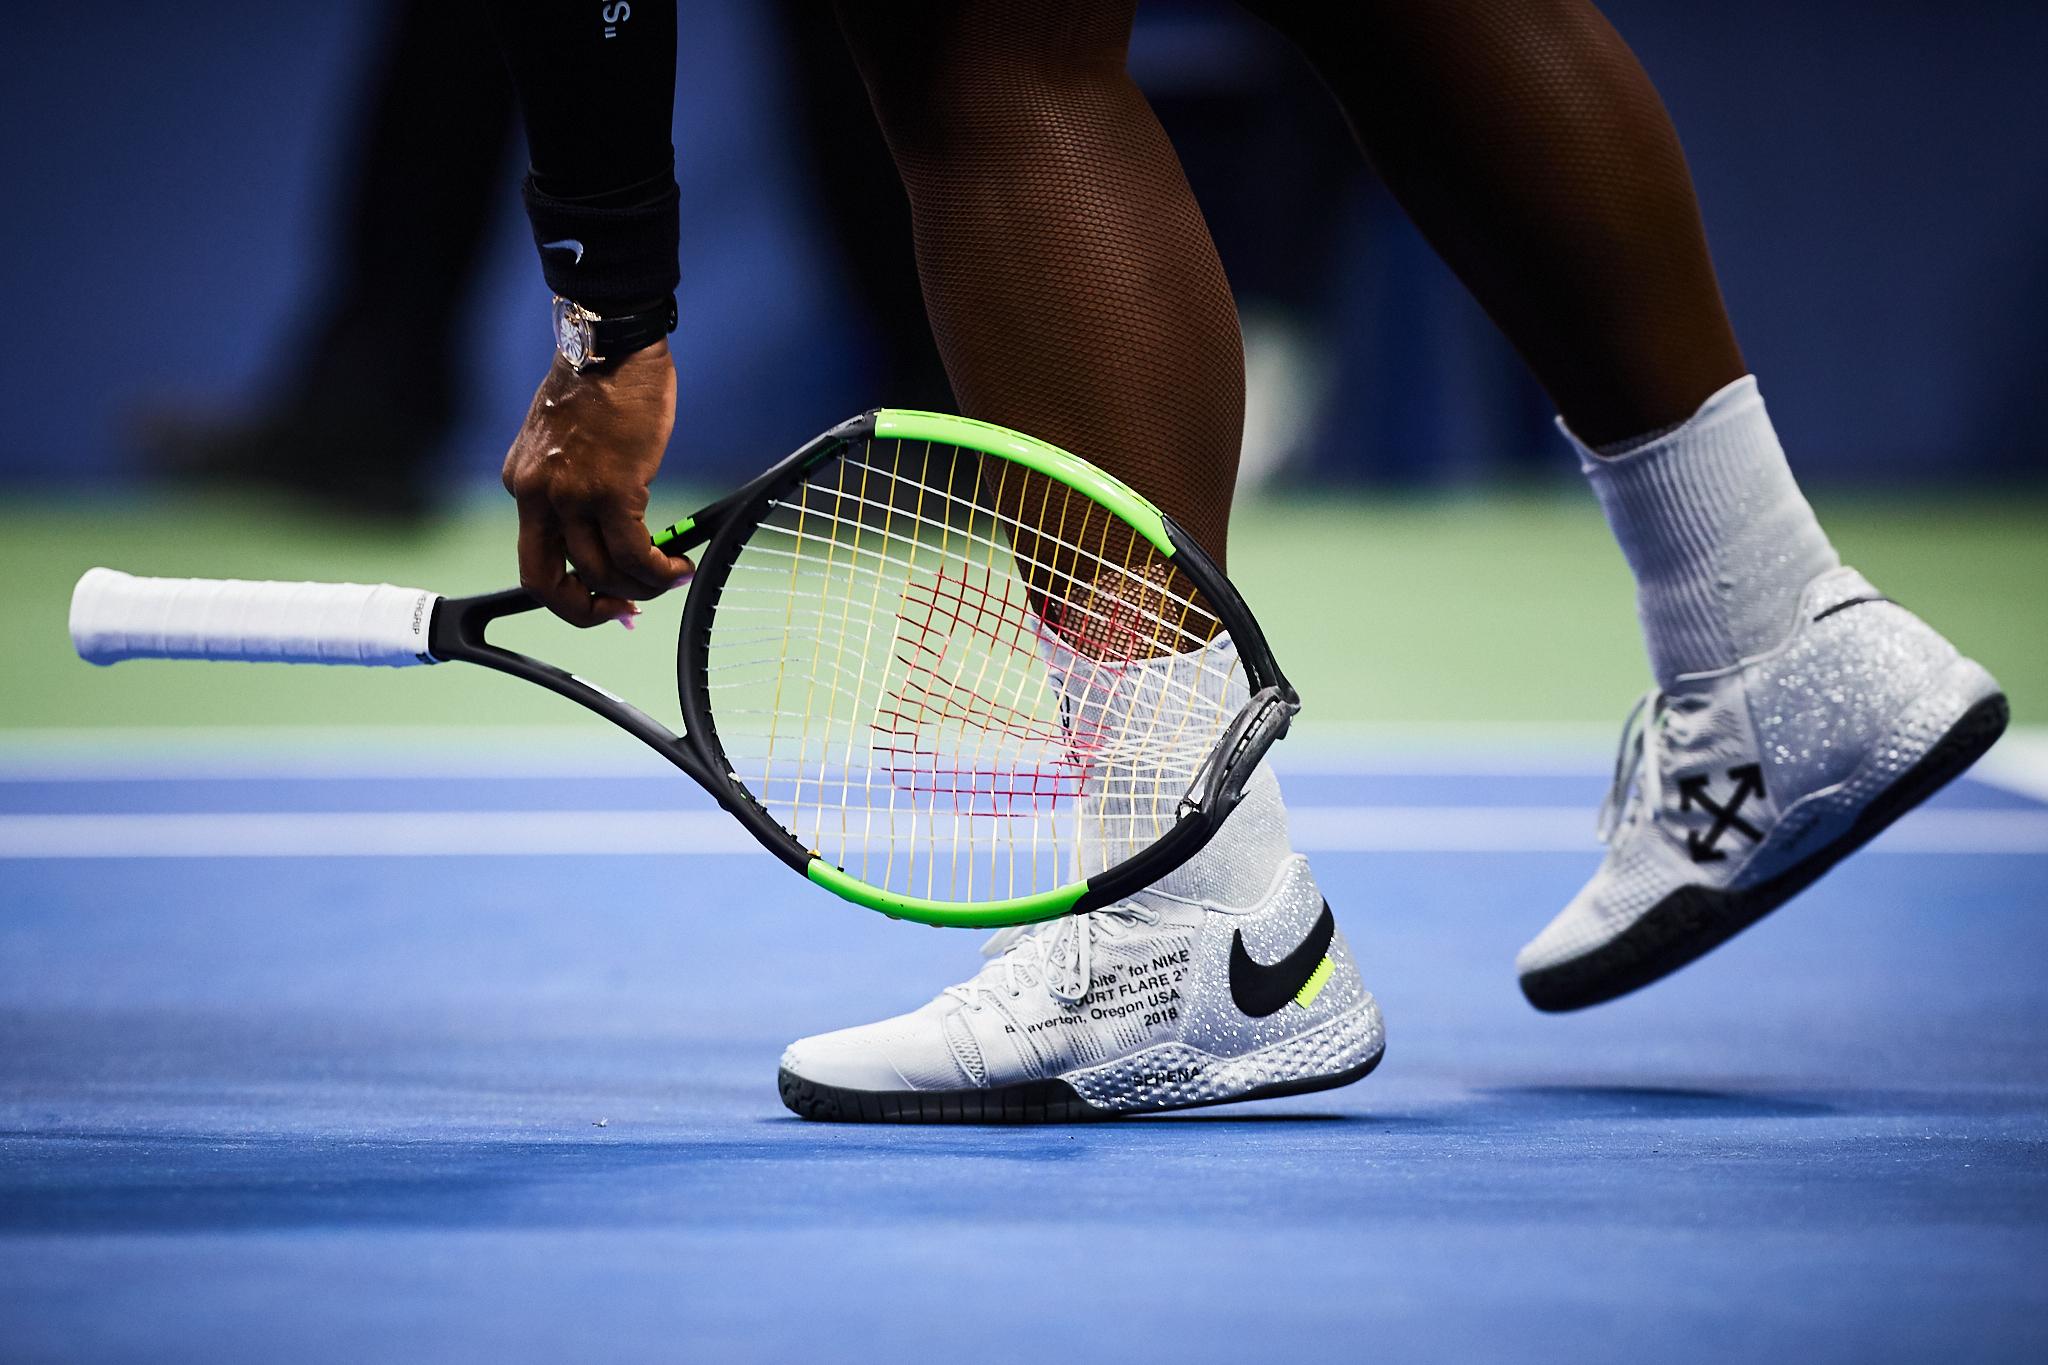 Serena Williams, Arthur Ashe Stadium, Women's Singles Final  Canon EOS 1DXm2, EF-L 300mm f2.8 IS-II